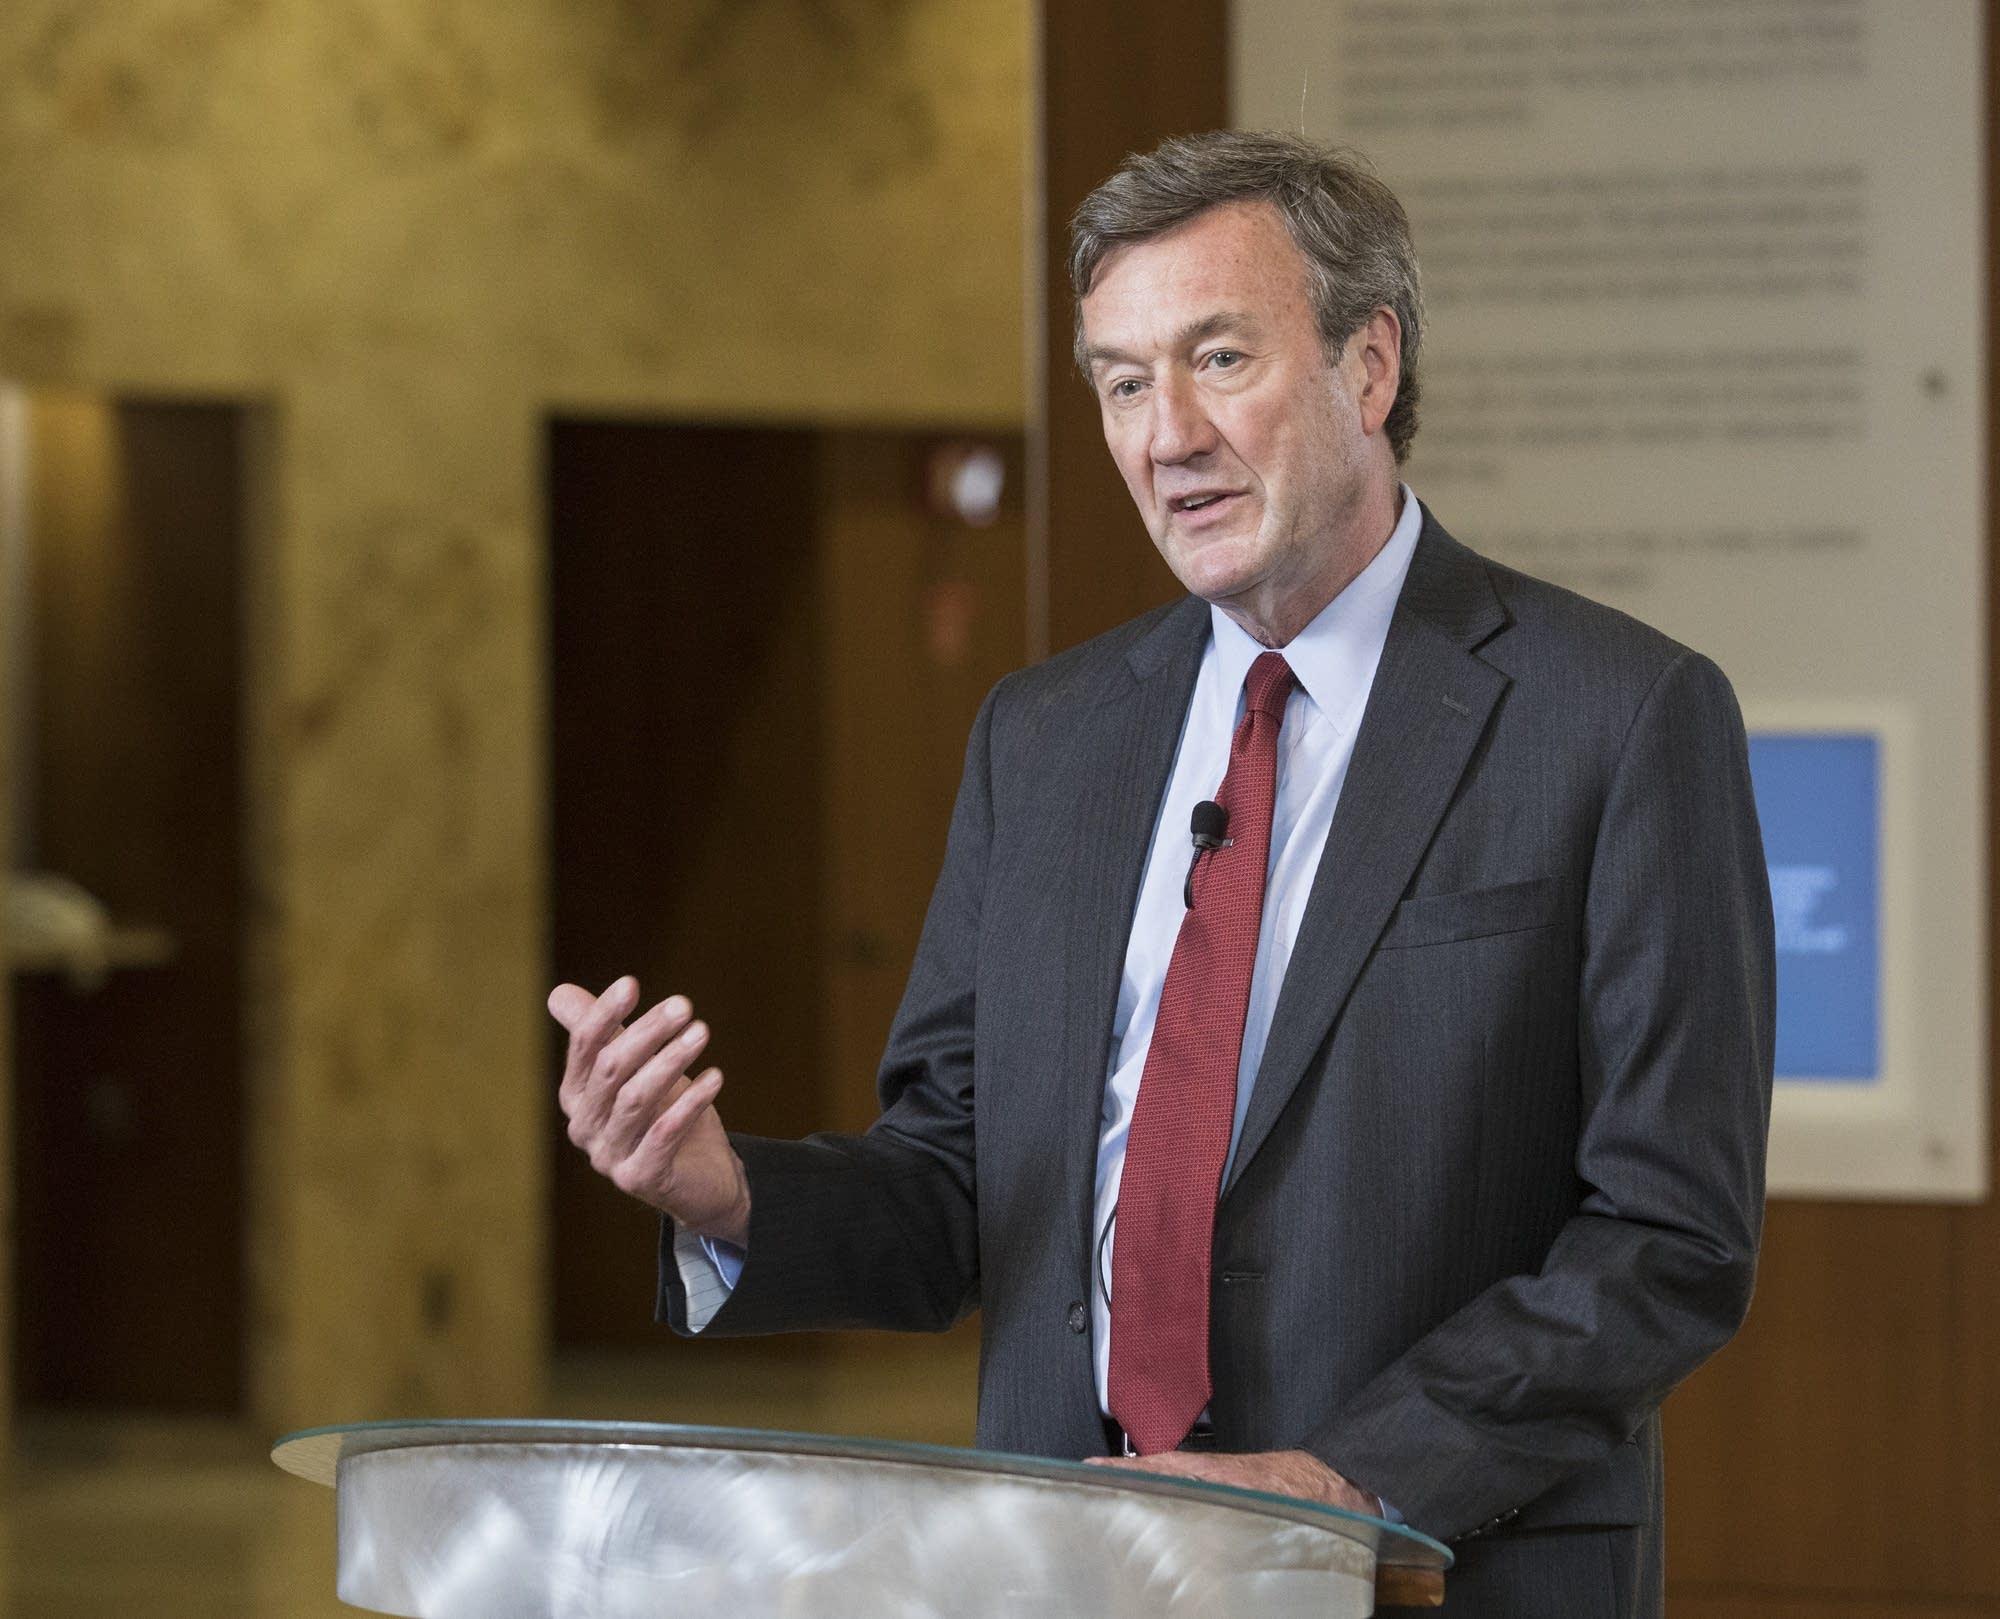 John Noseworthy M.D., announced his successor.